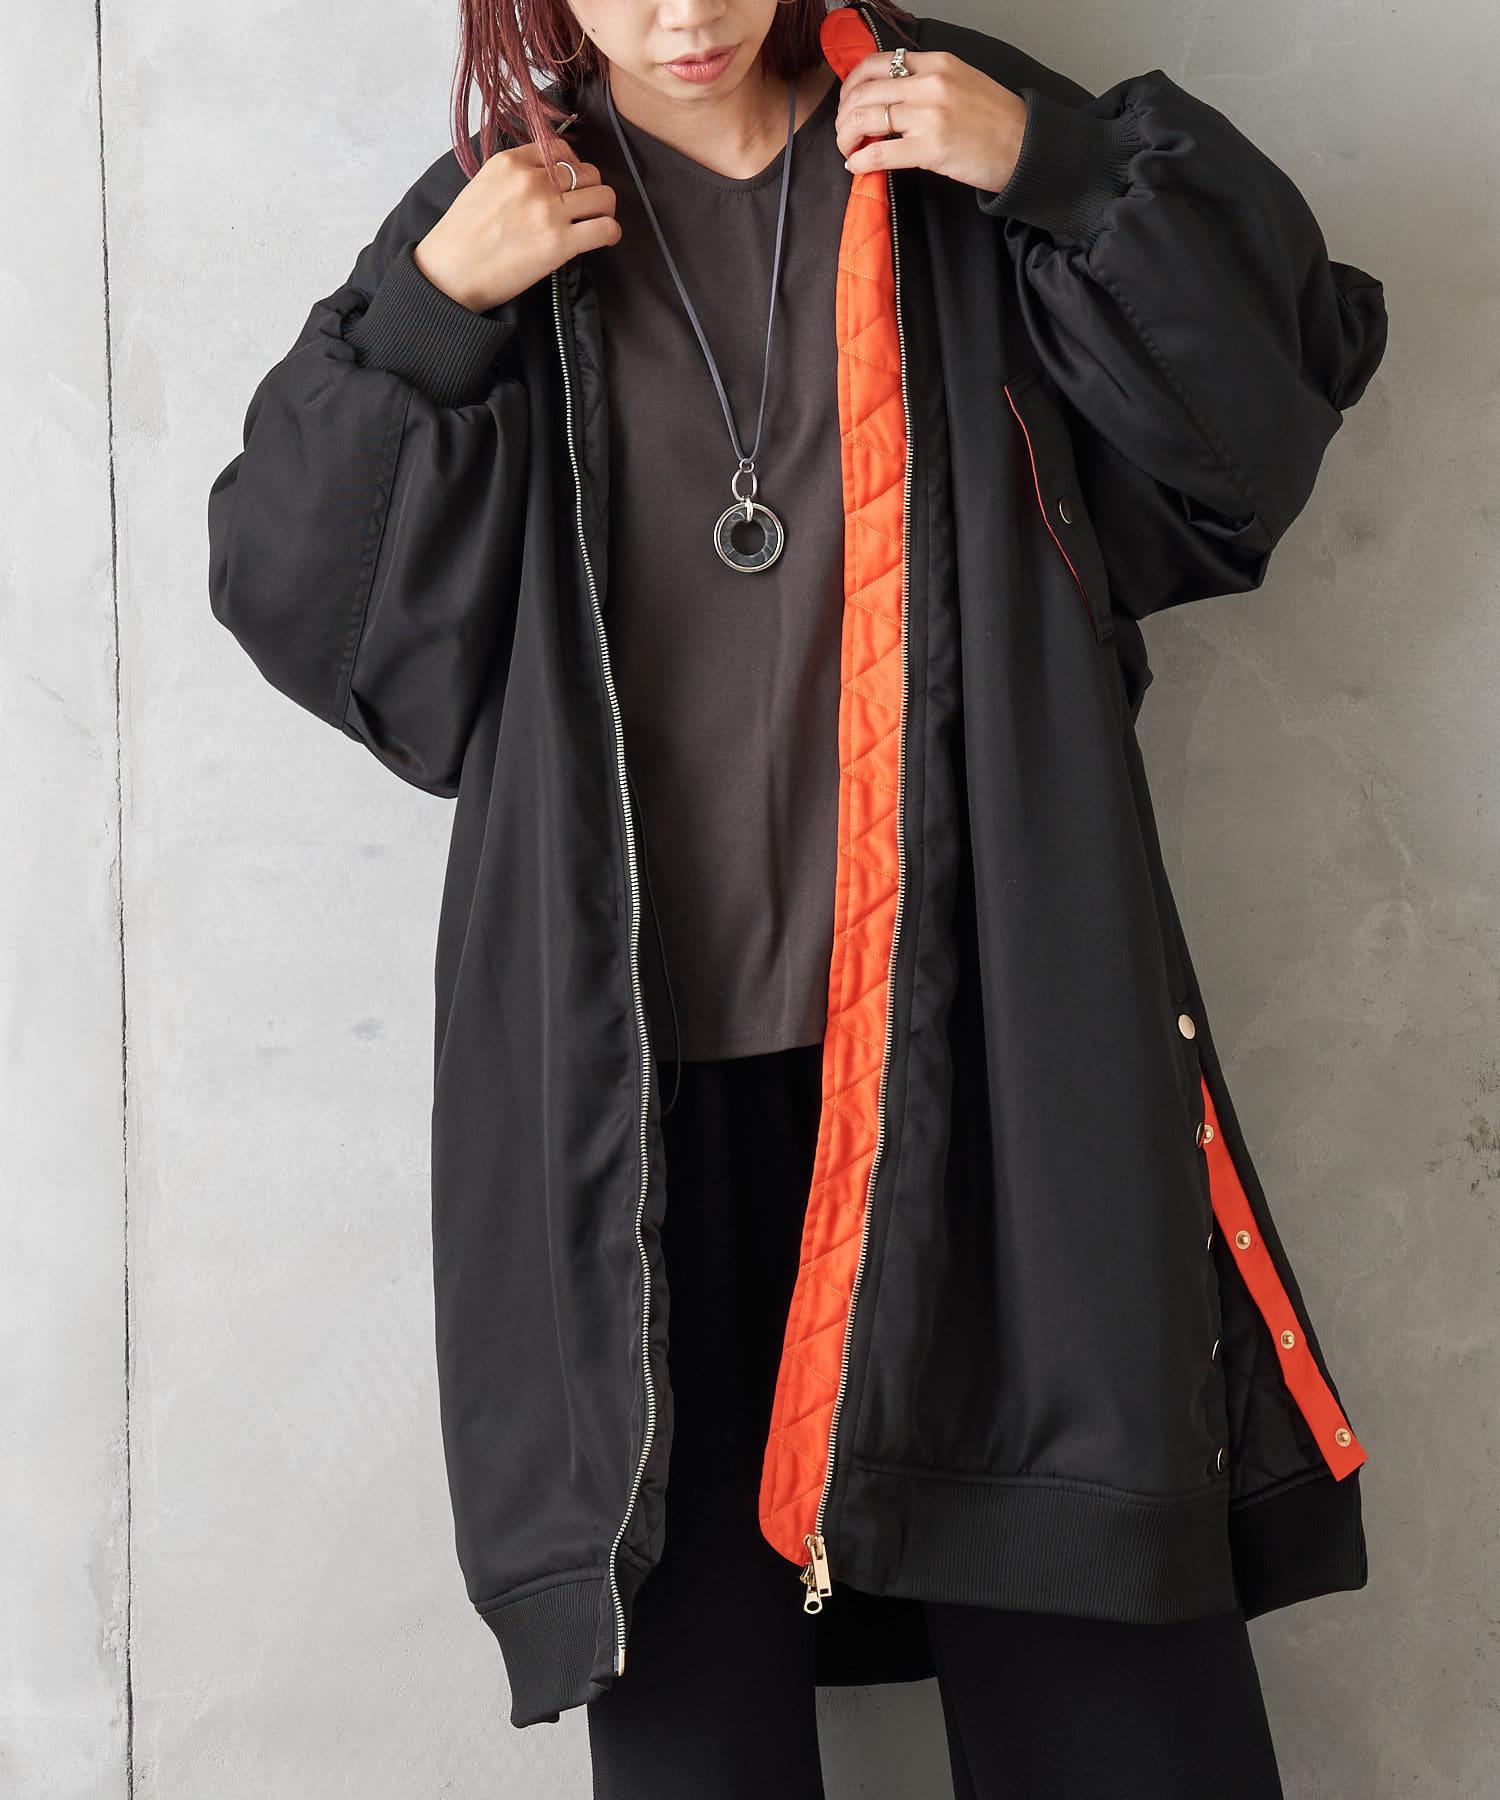 Pal collection(パルコレクション) 【予約】《お尻も隠れる長さ》ロングMA-1